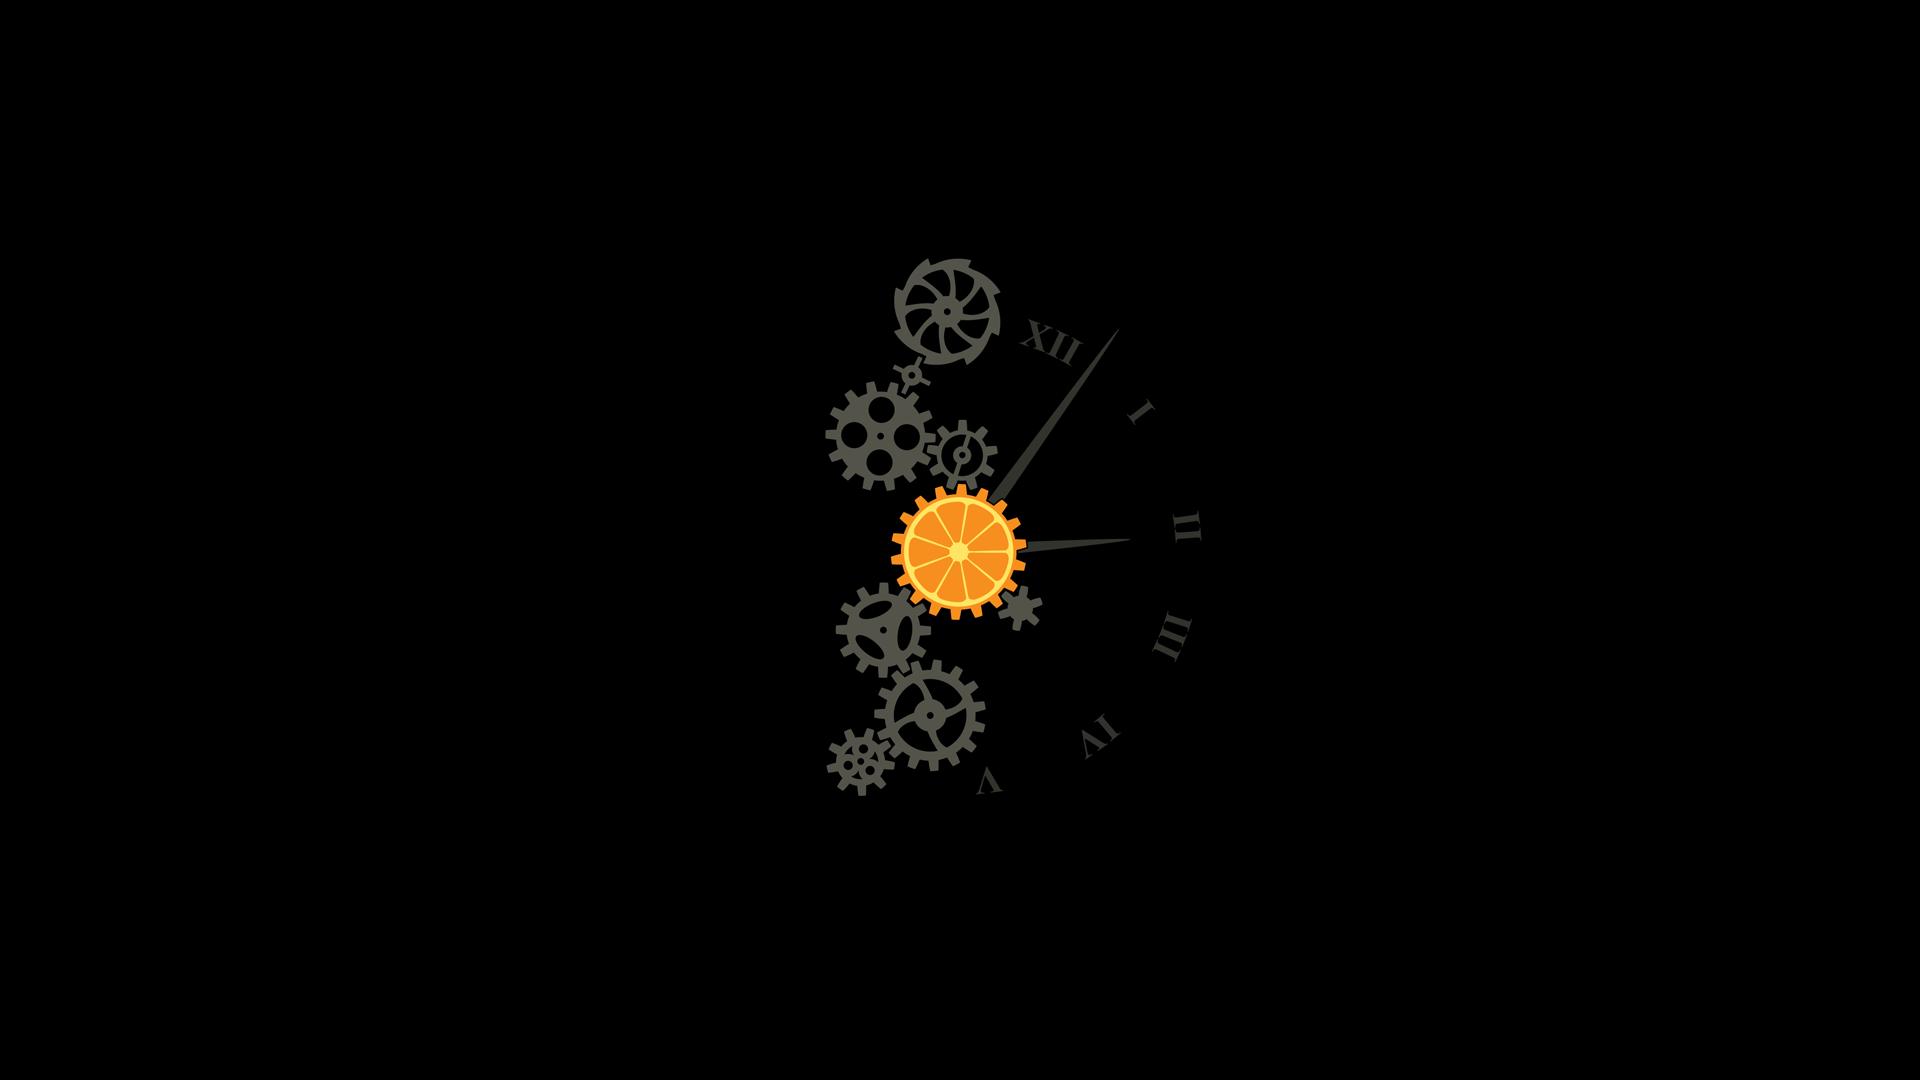 General 1920x1080 minimalism simple background A Clockwork Orange simple gears clocks selective coloring black background